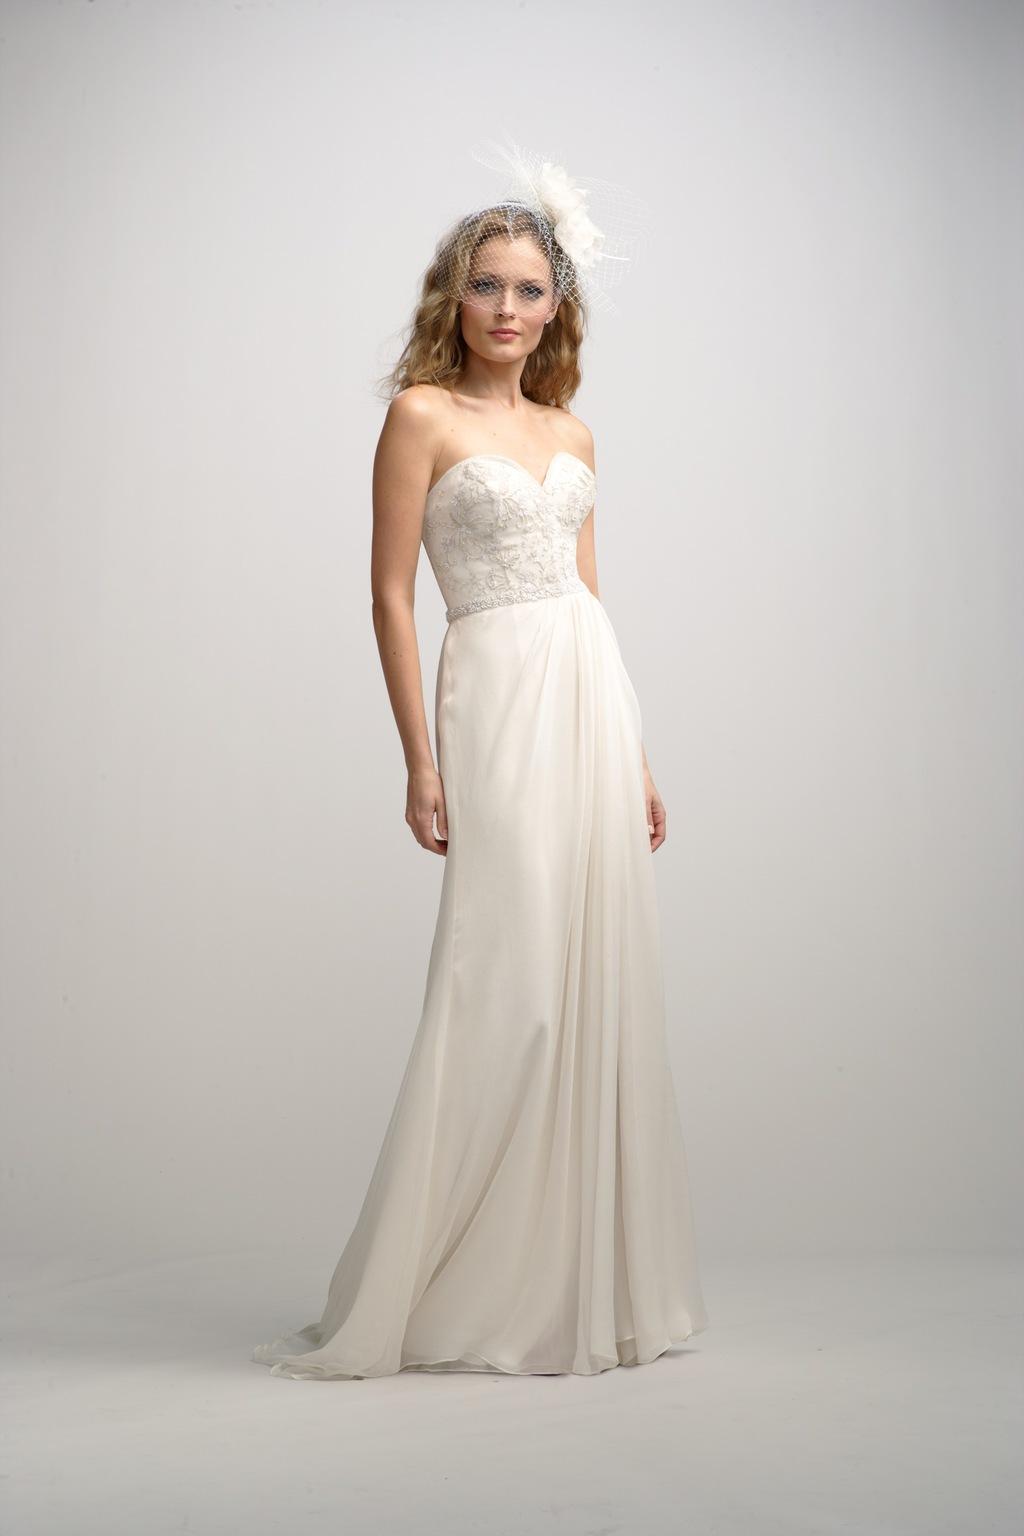 Fall-2012-wedding-dress-watters-bridal-gown-7.original.full